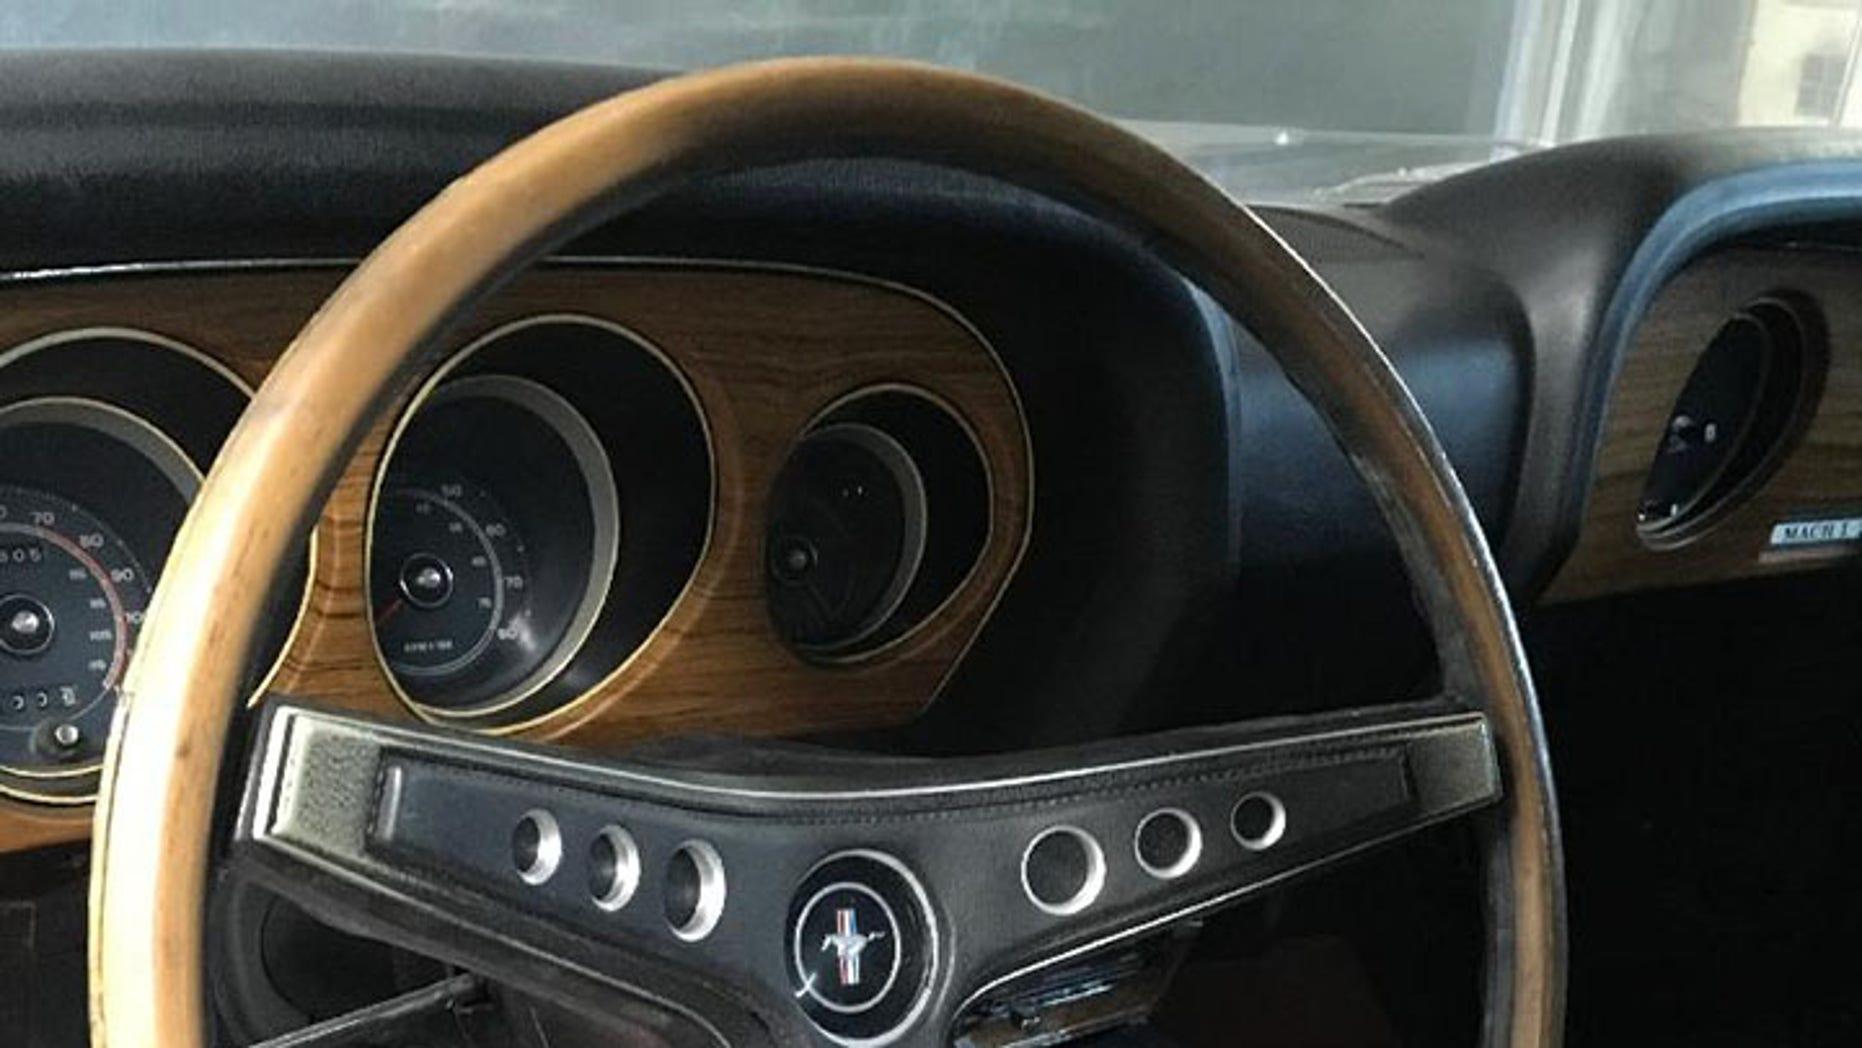 1969 Ford Mustang Mach 1 Cobra Jet interior